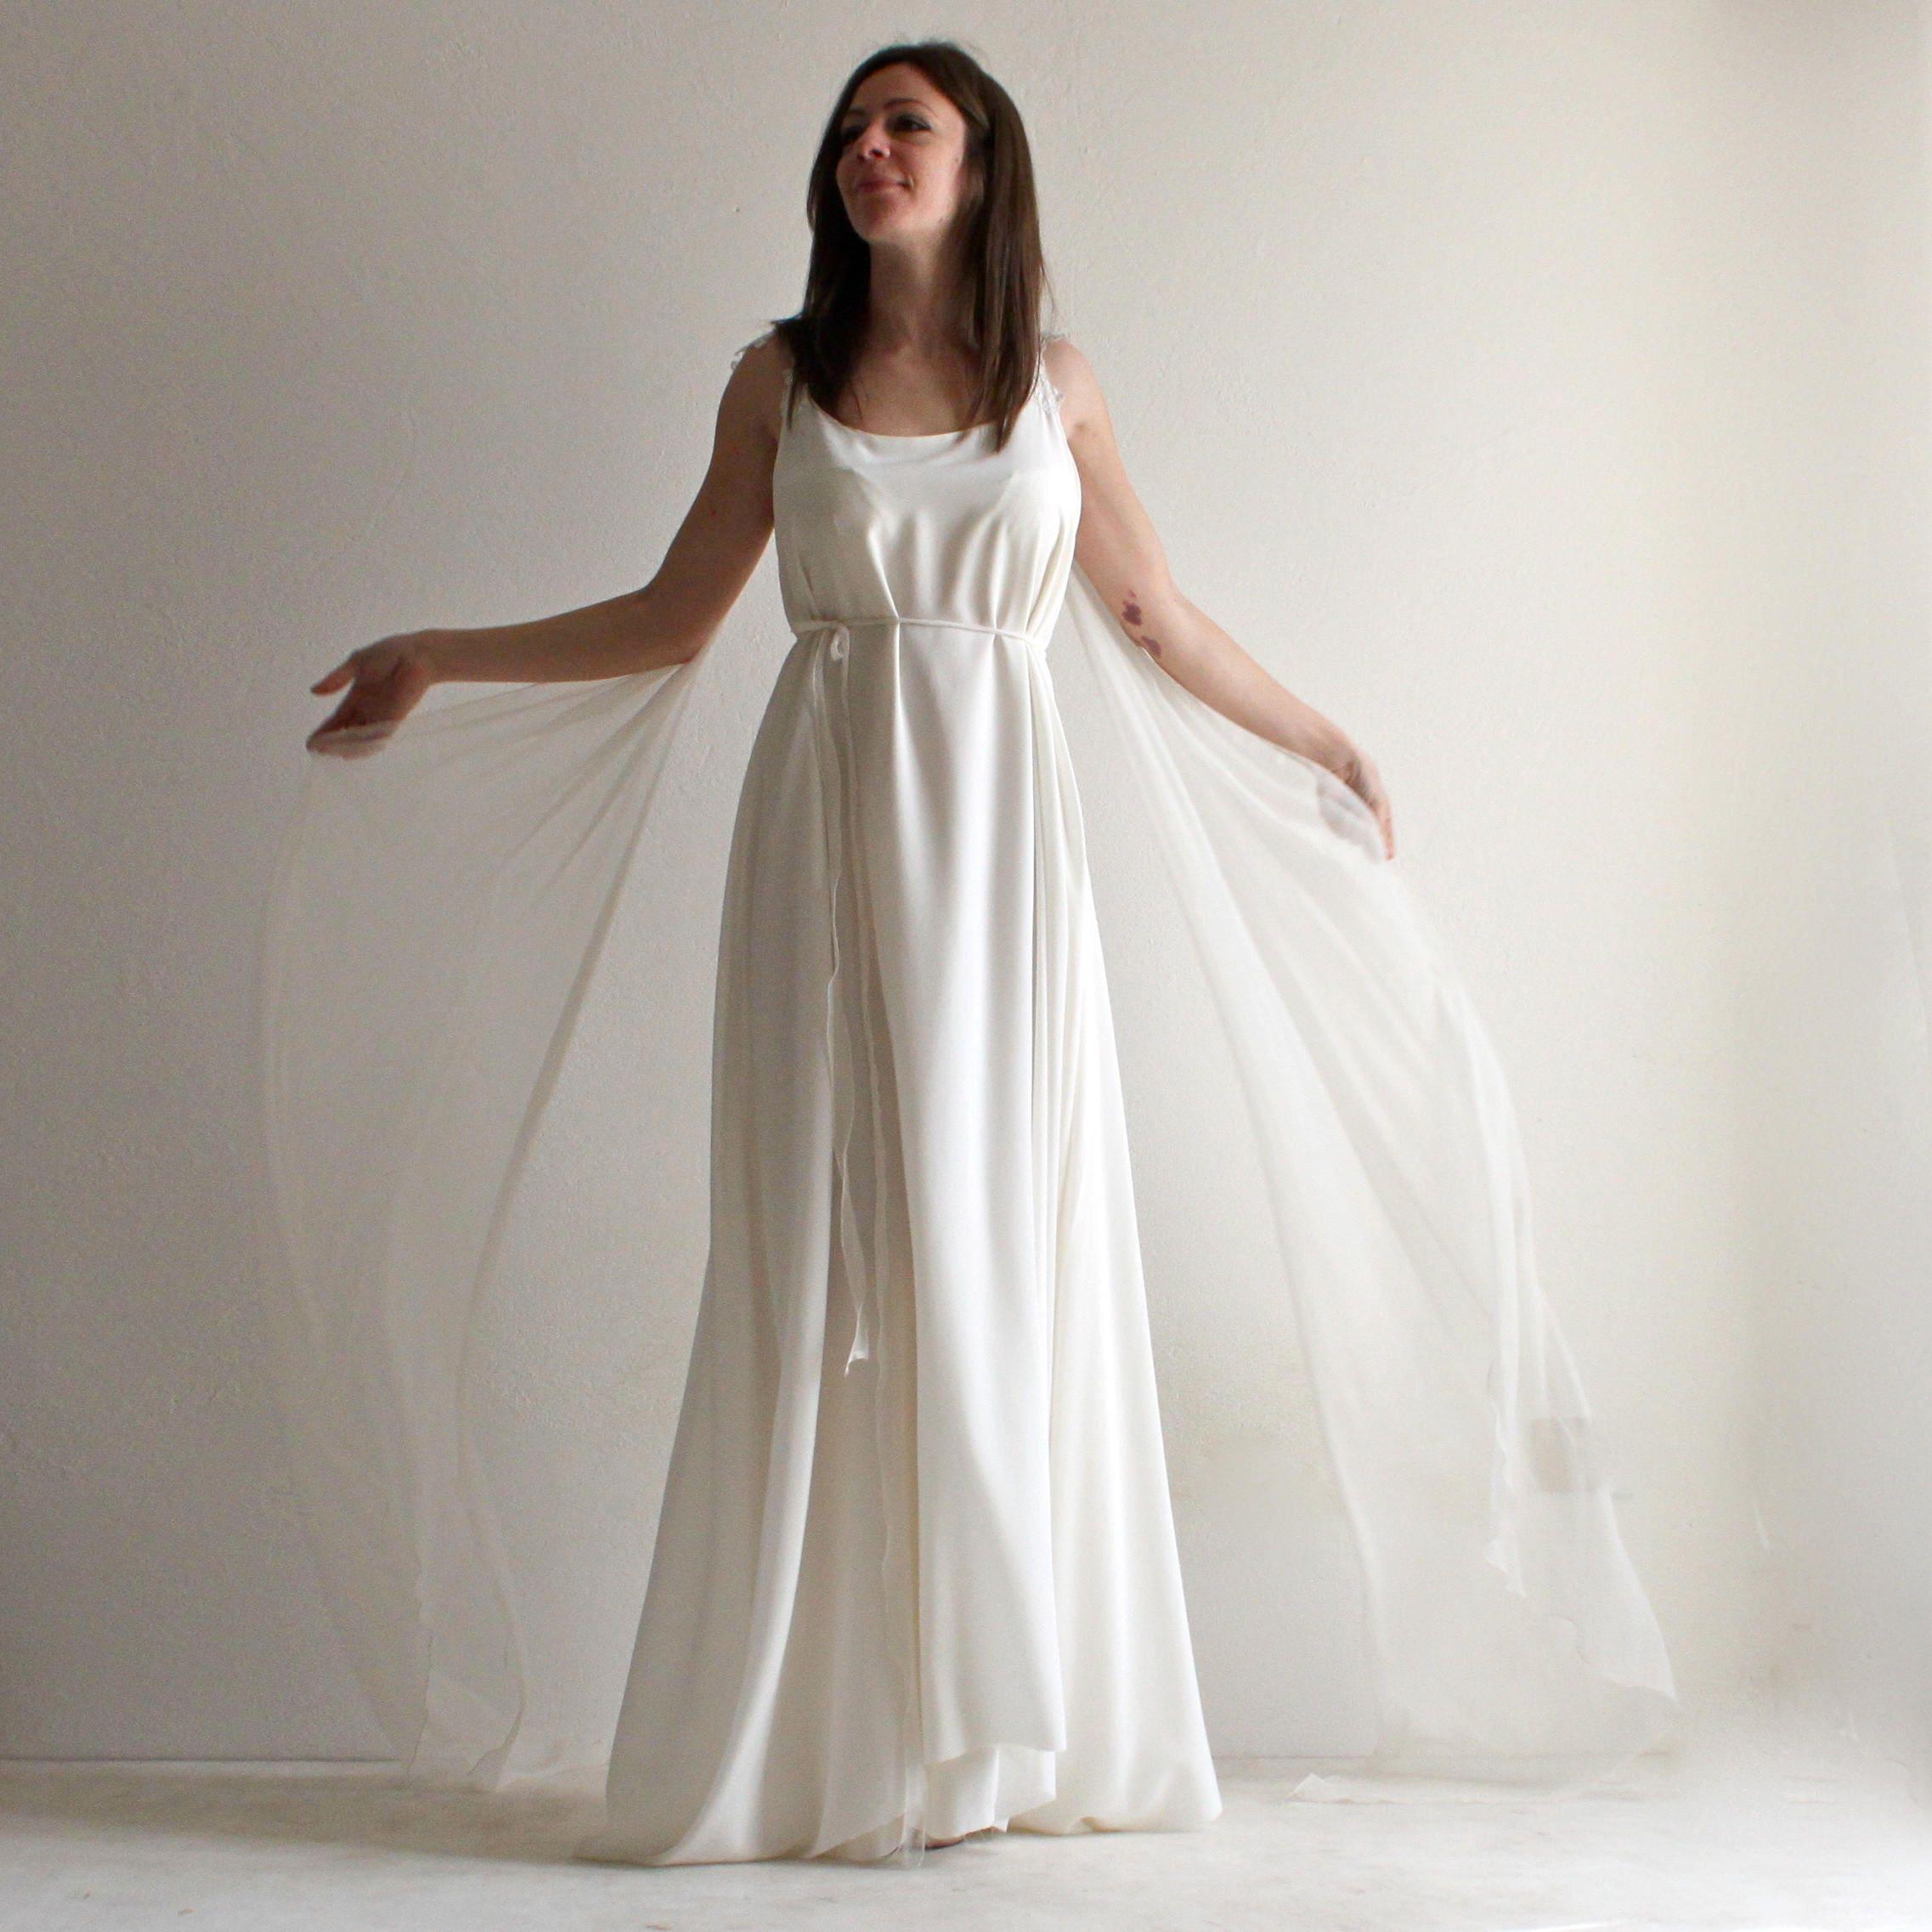 Brautkleid Boho Brautkleid Ethereal Hochzeit Kleid Tunika